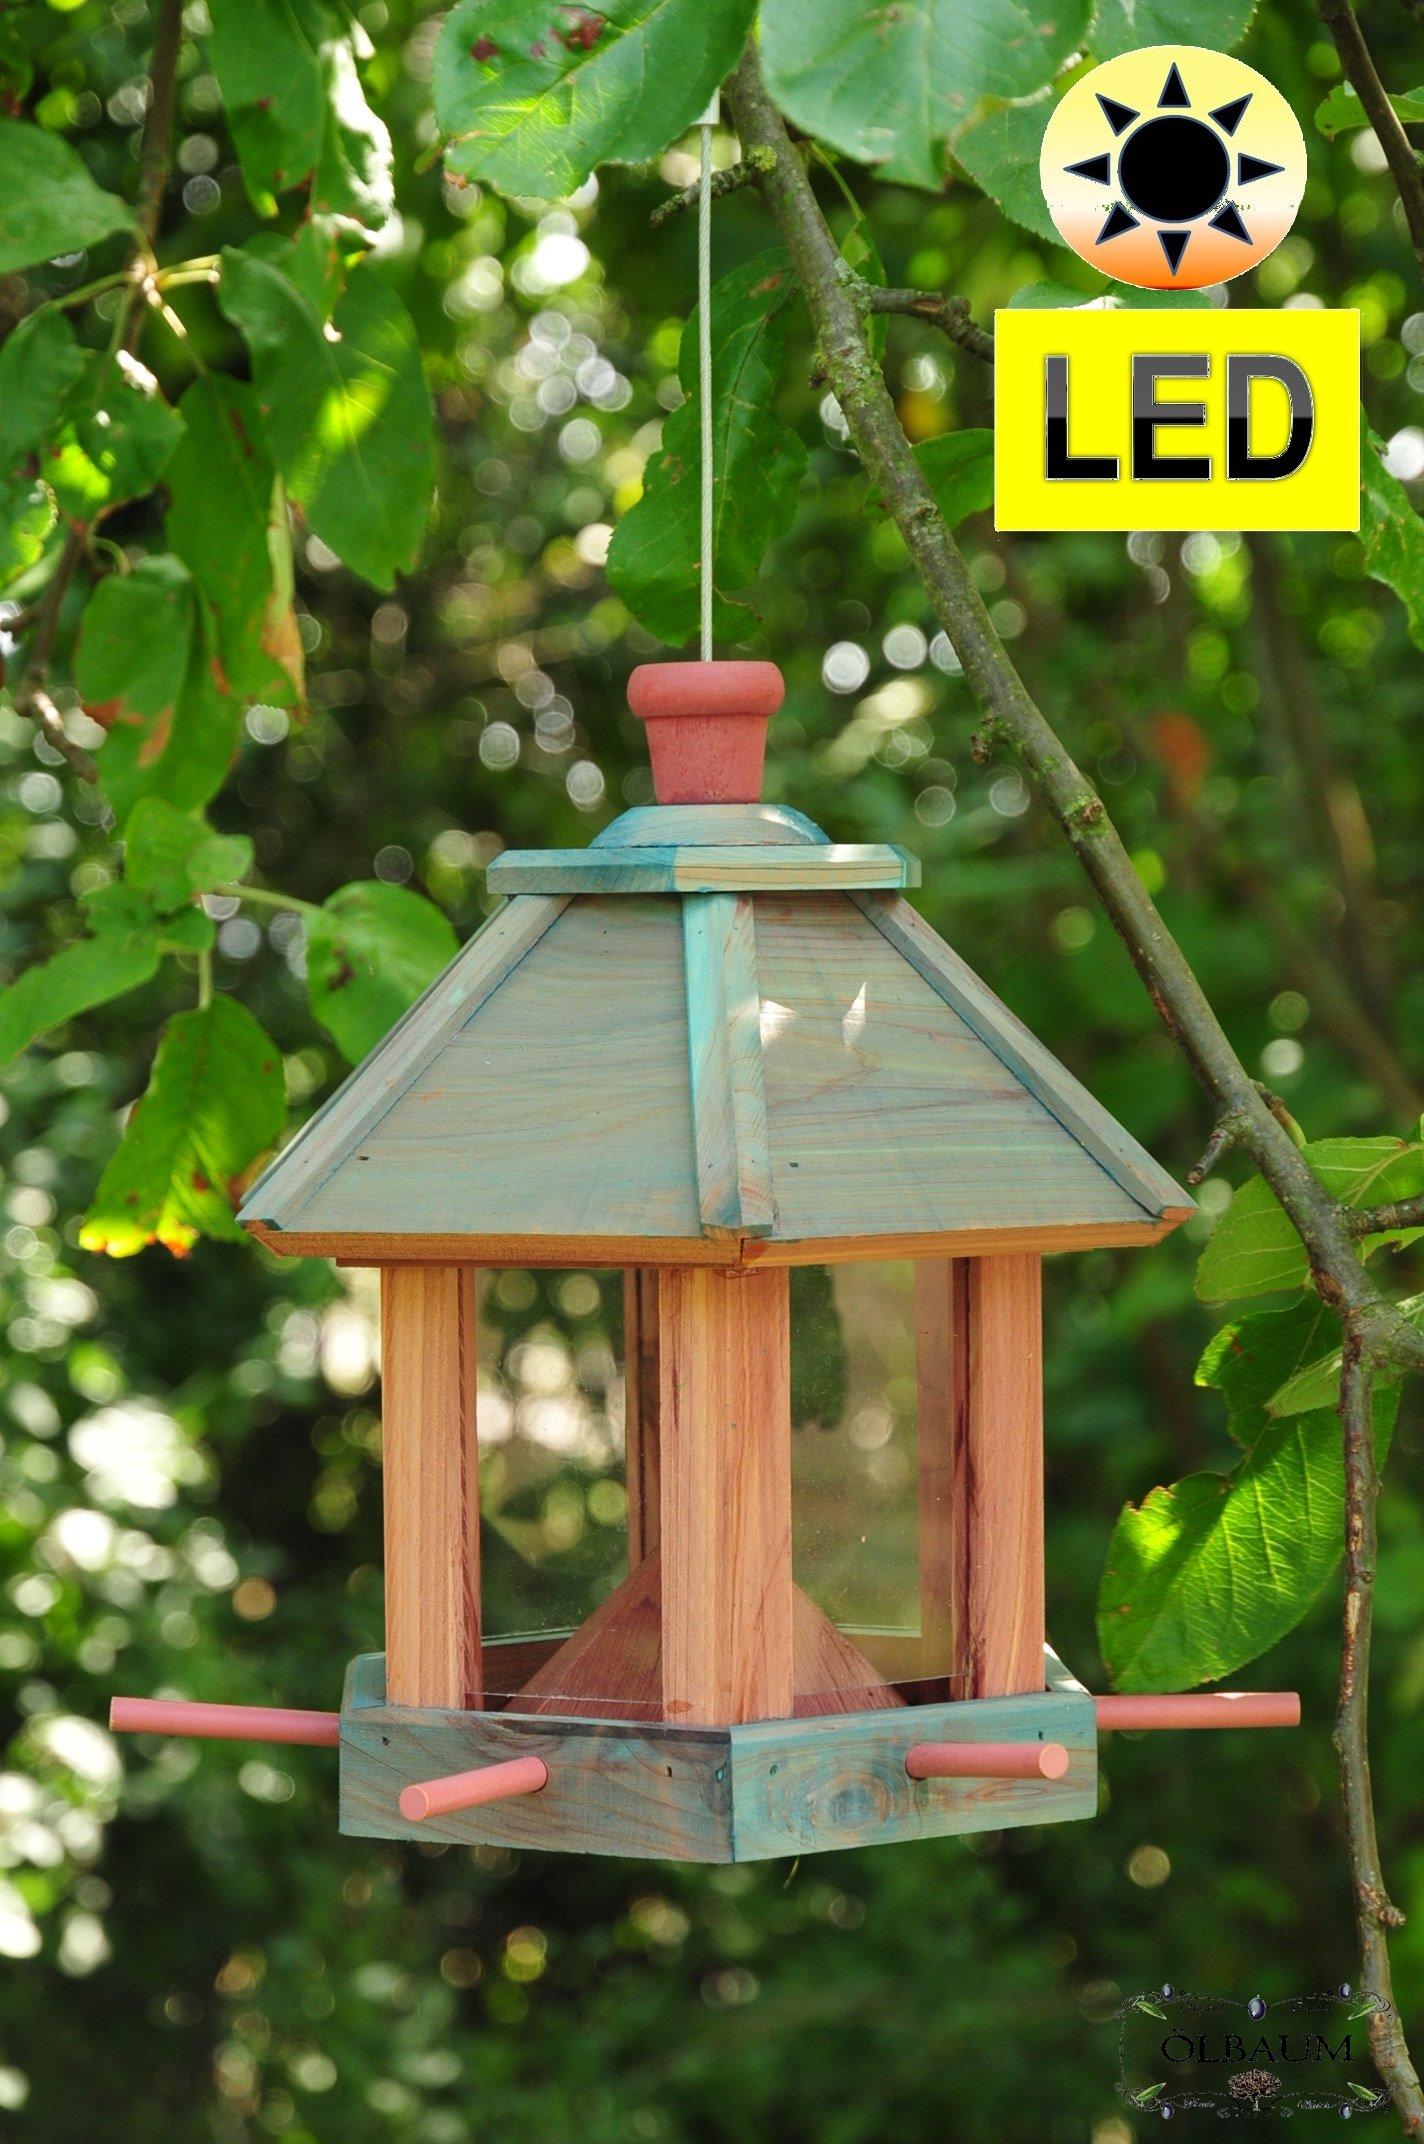 Madera-pajarera, Futterhaus-Futterstation, con iluminación jardín -, LED-luz/pajarera, Futterhaus-Futterstation, con iluminación jardín, nido SKY Blue (azul claro), Bel-azul resistente, estable, Premium pájaro casa, Futterhaus-Futterstation, con ...